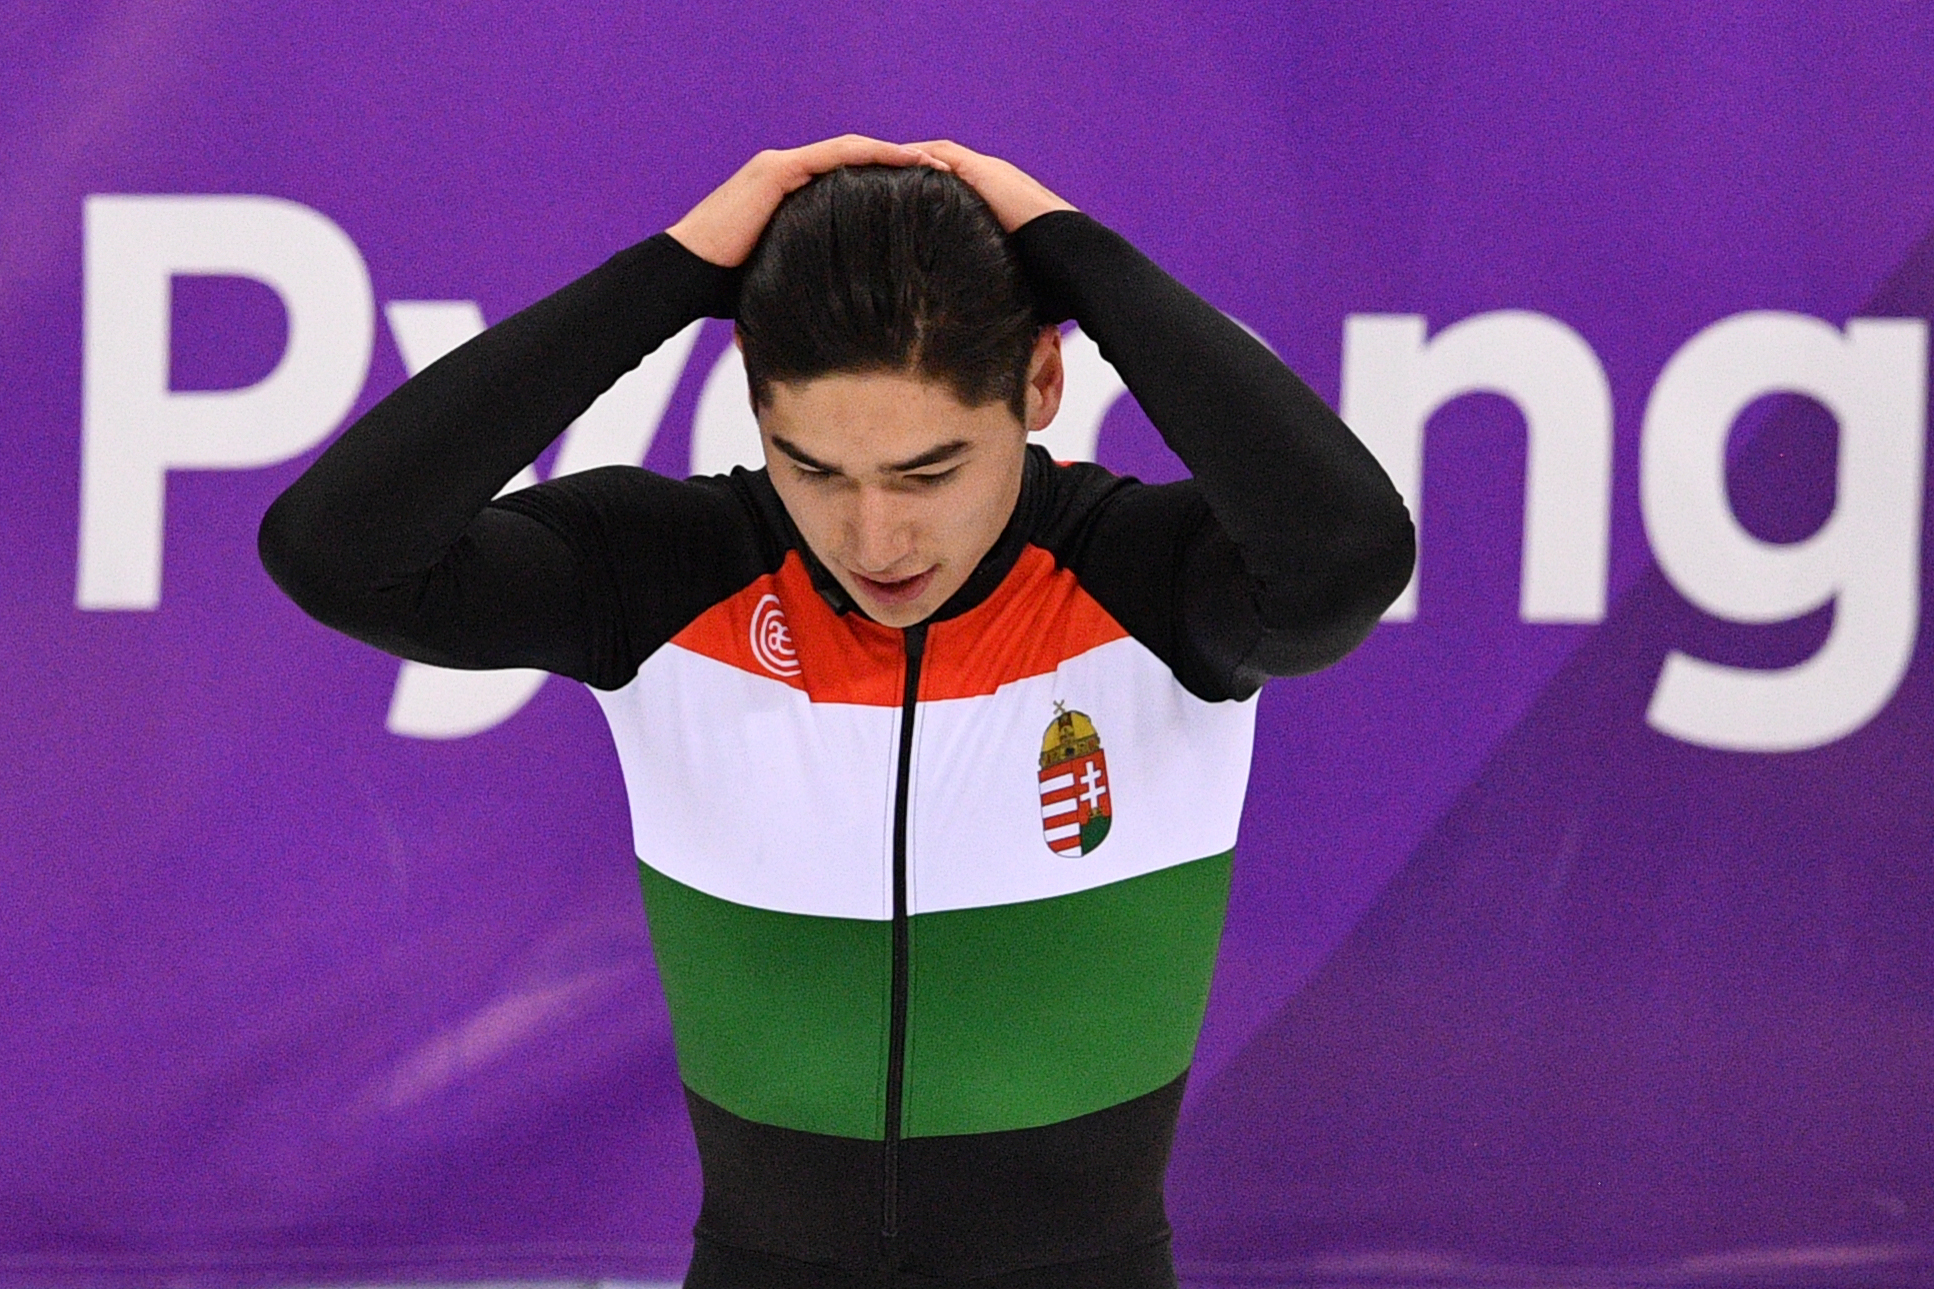 Liu Shaoang aranyérmet nyert a debreceni Eb-n